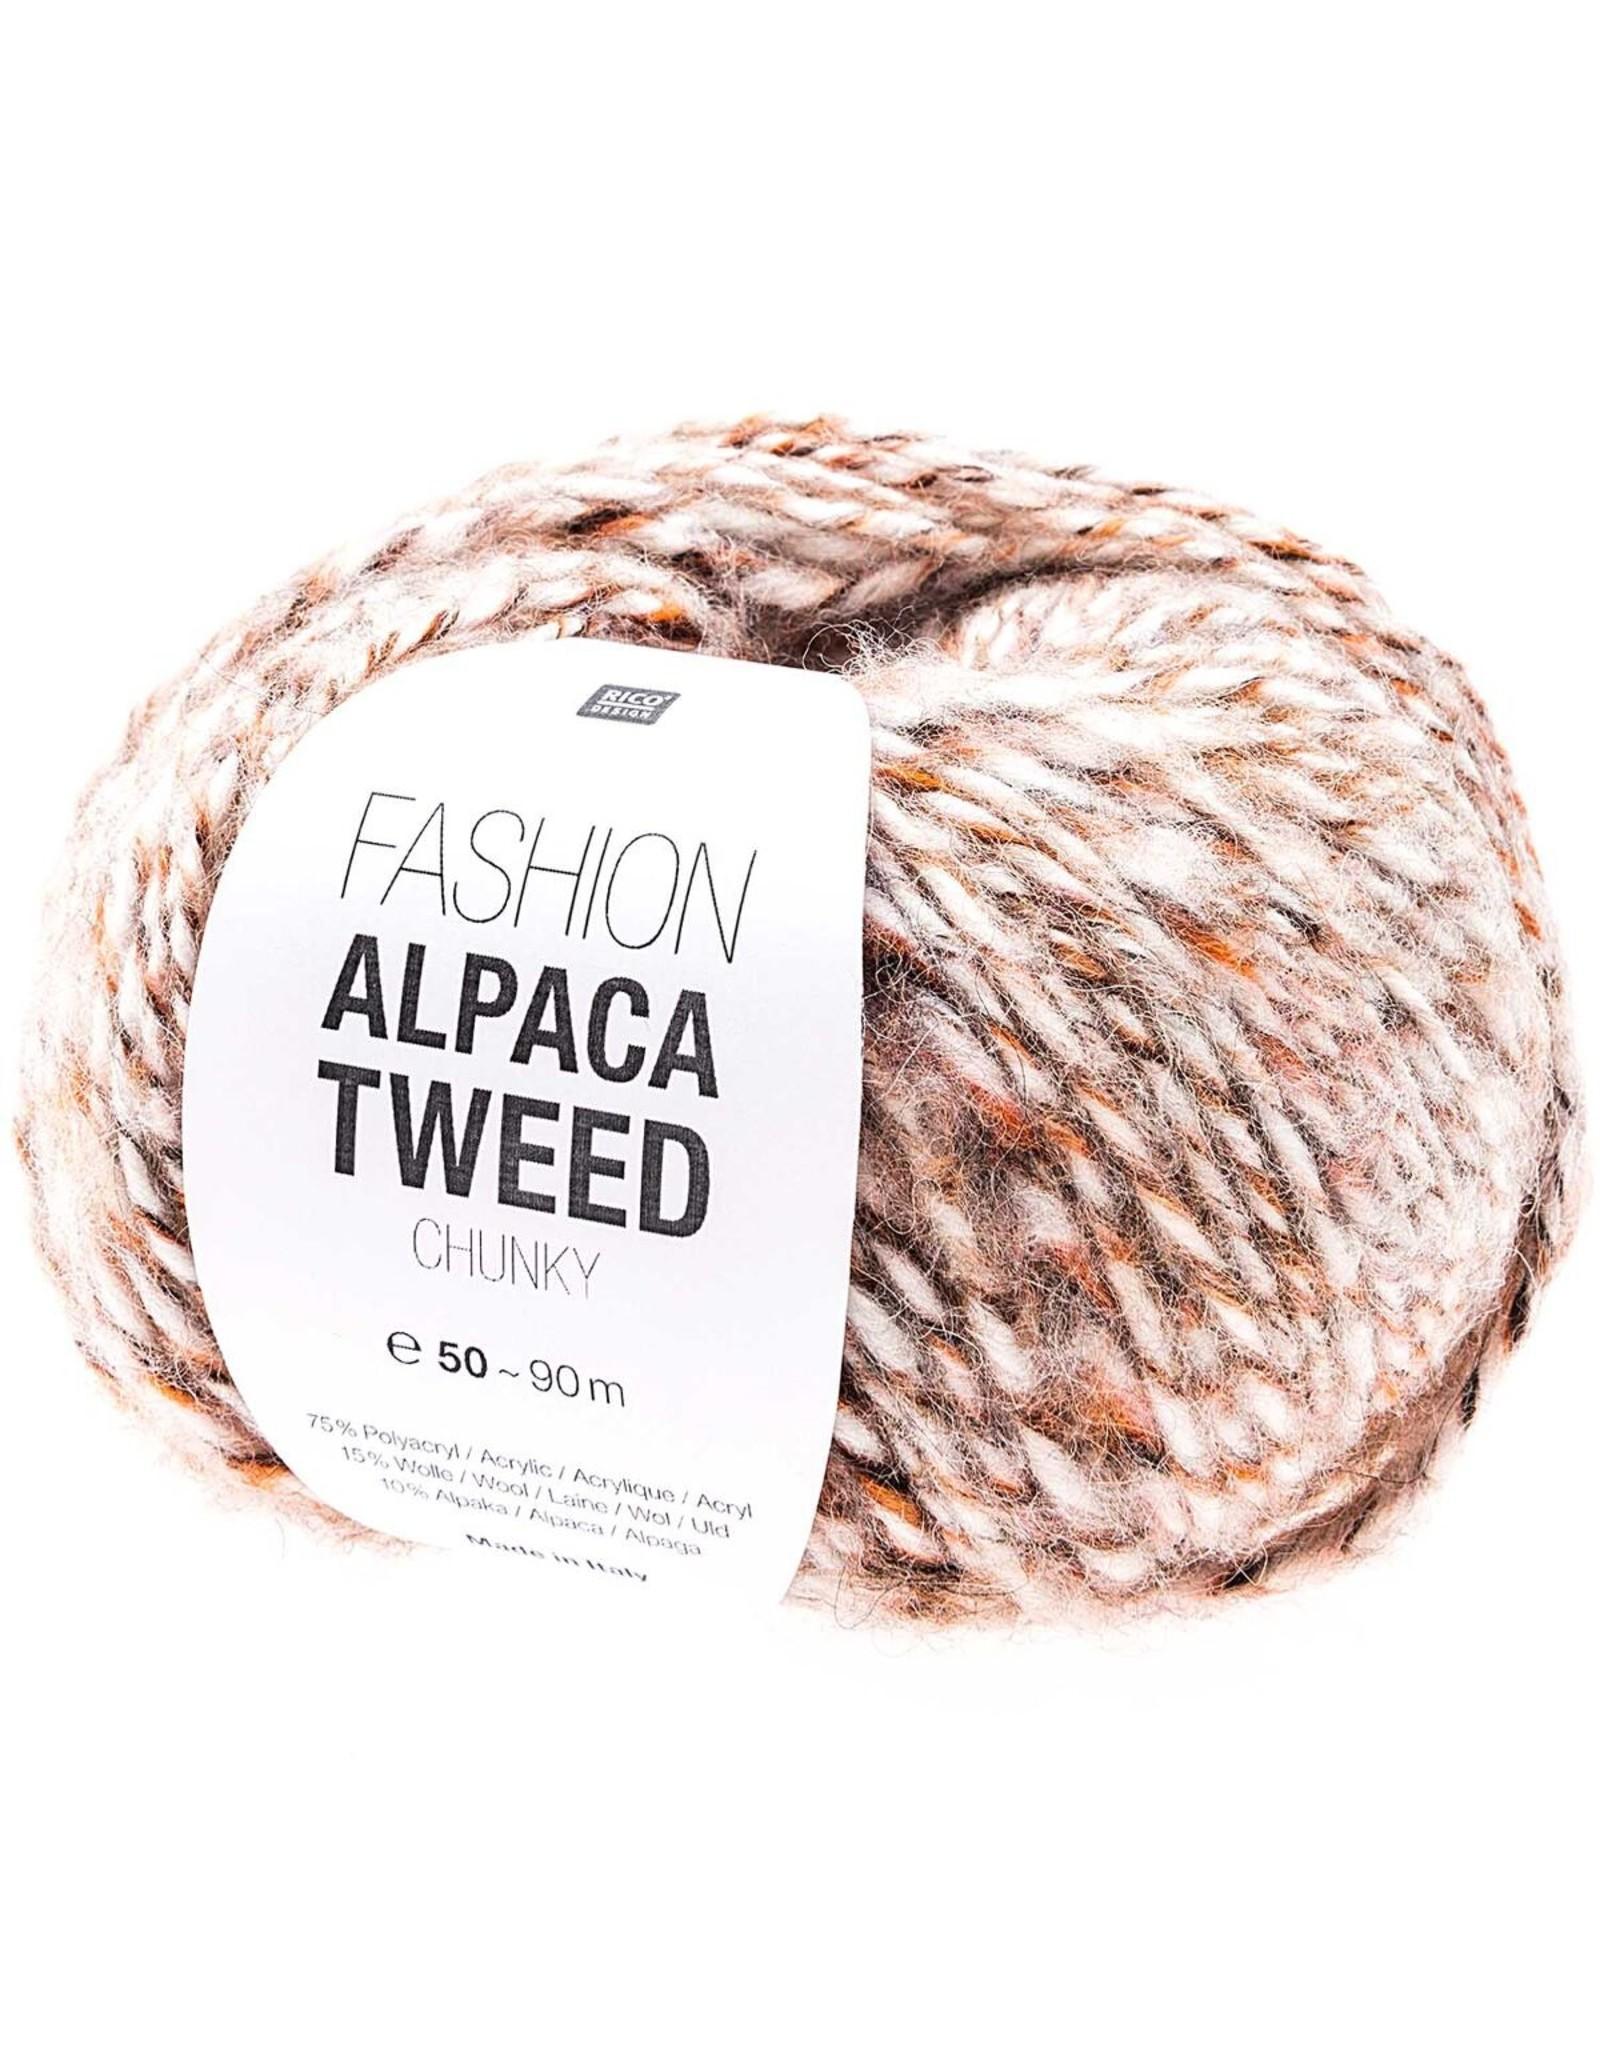 Rico Rico Fashion Alpaca Tweed Chunky